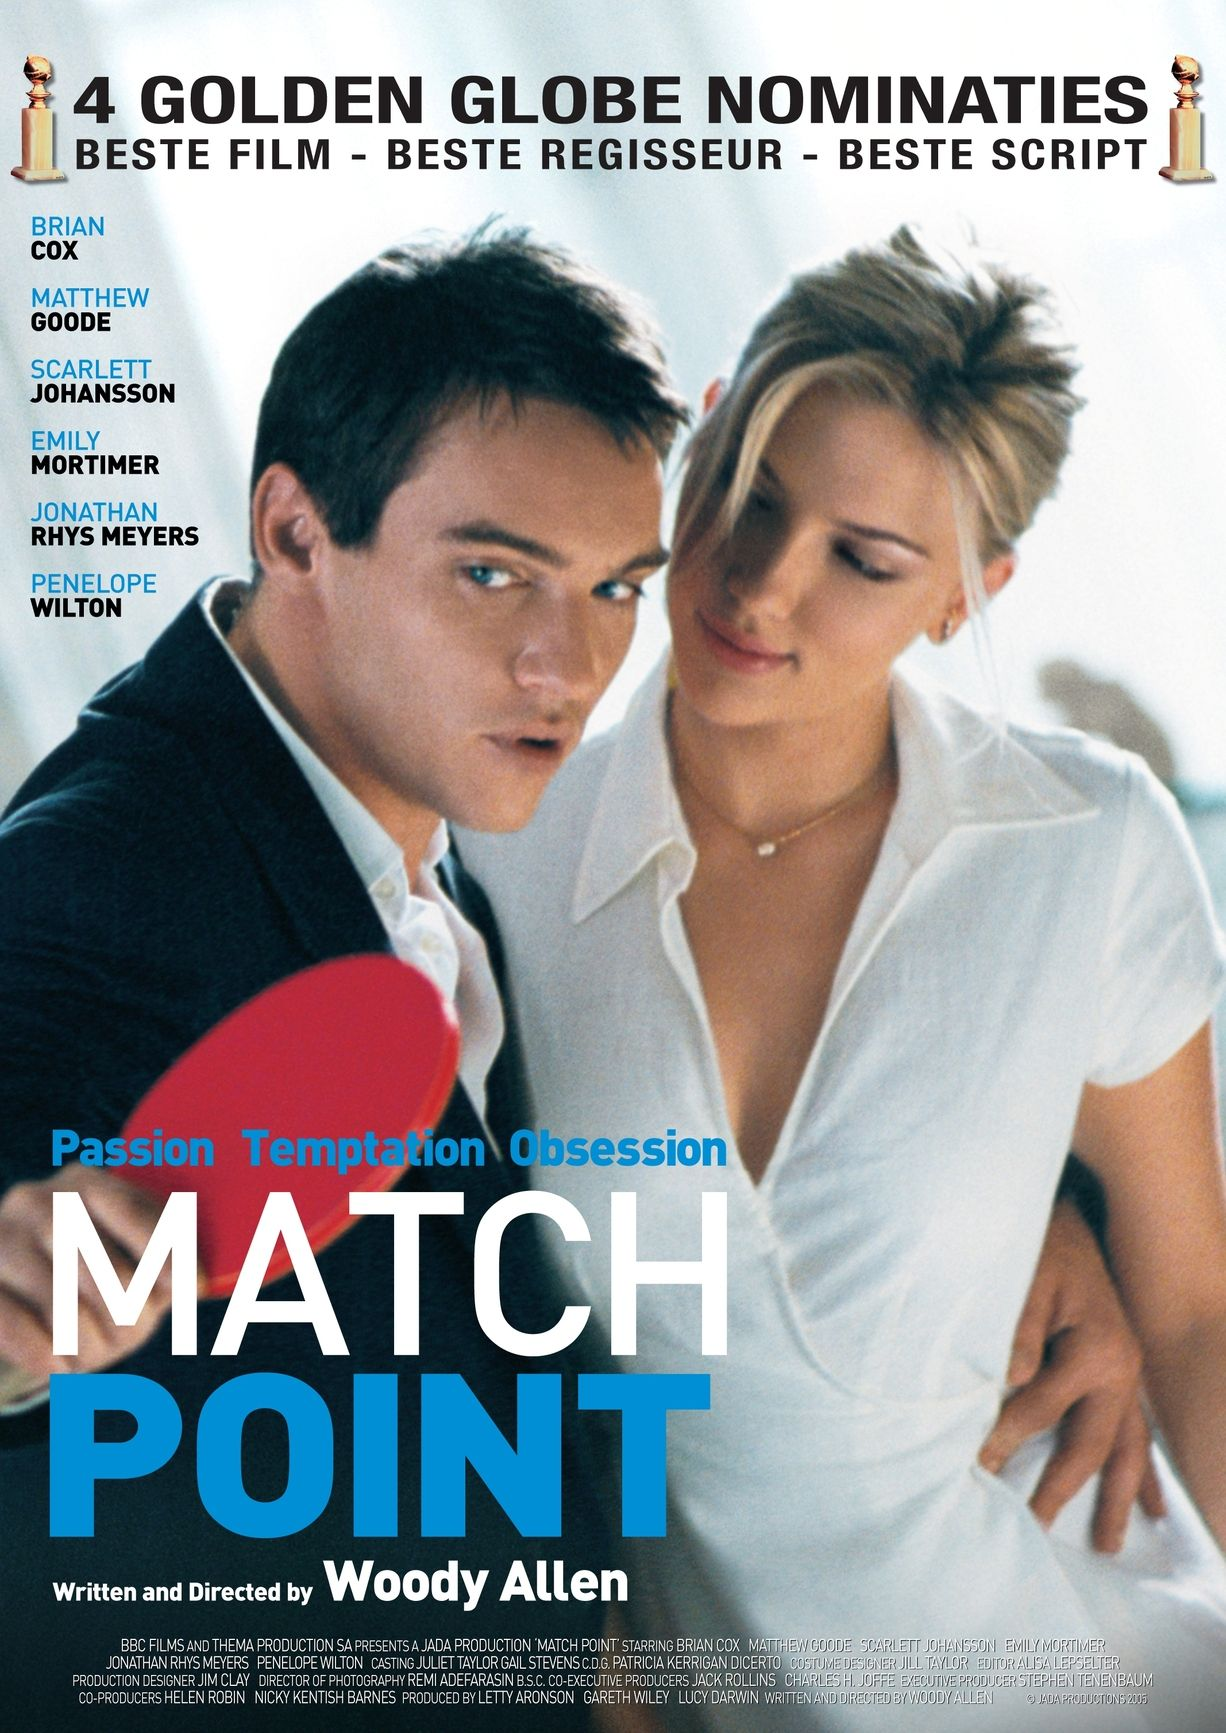 Matchpoint Movieposters 2005 Jonathanrhysmeyers Match Point Match Point Movie Woody Allen